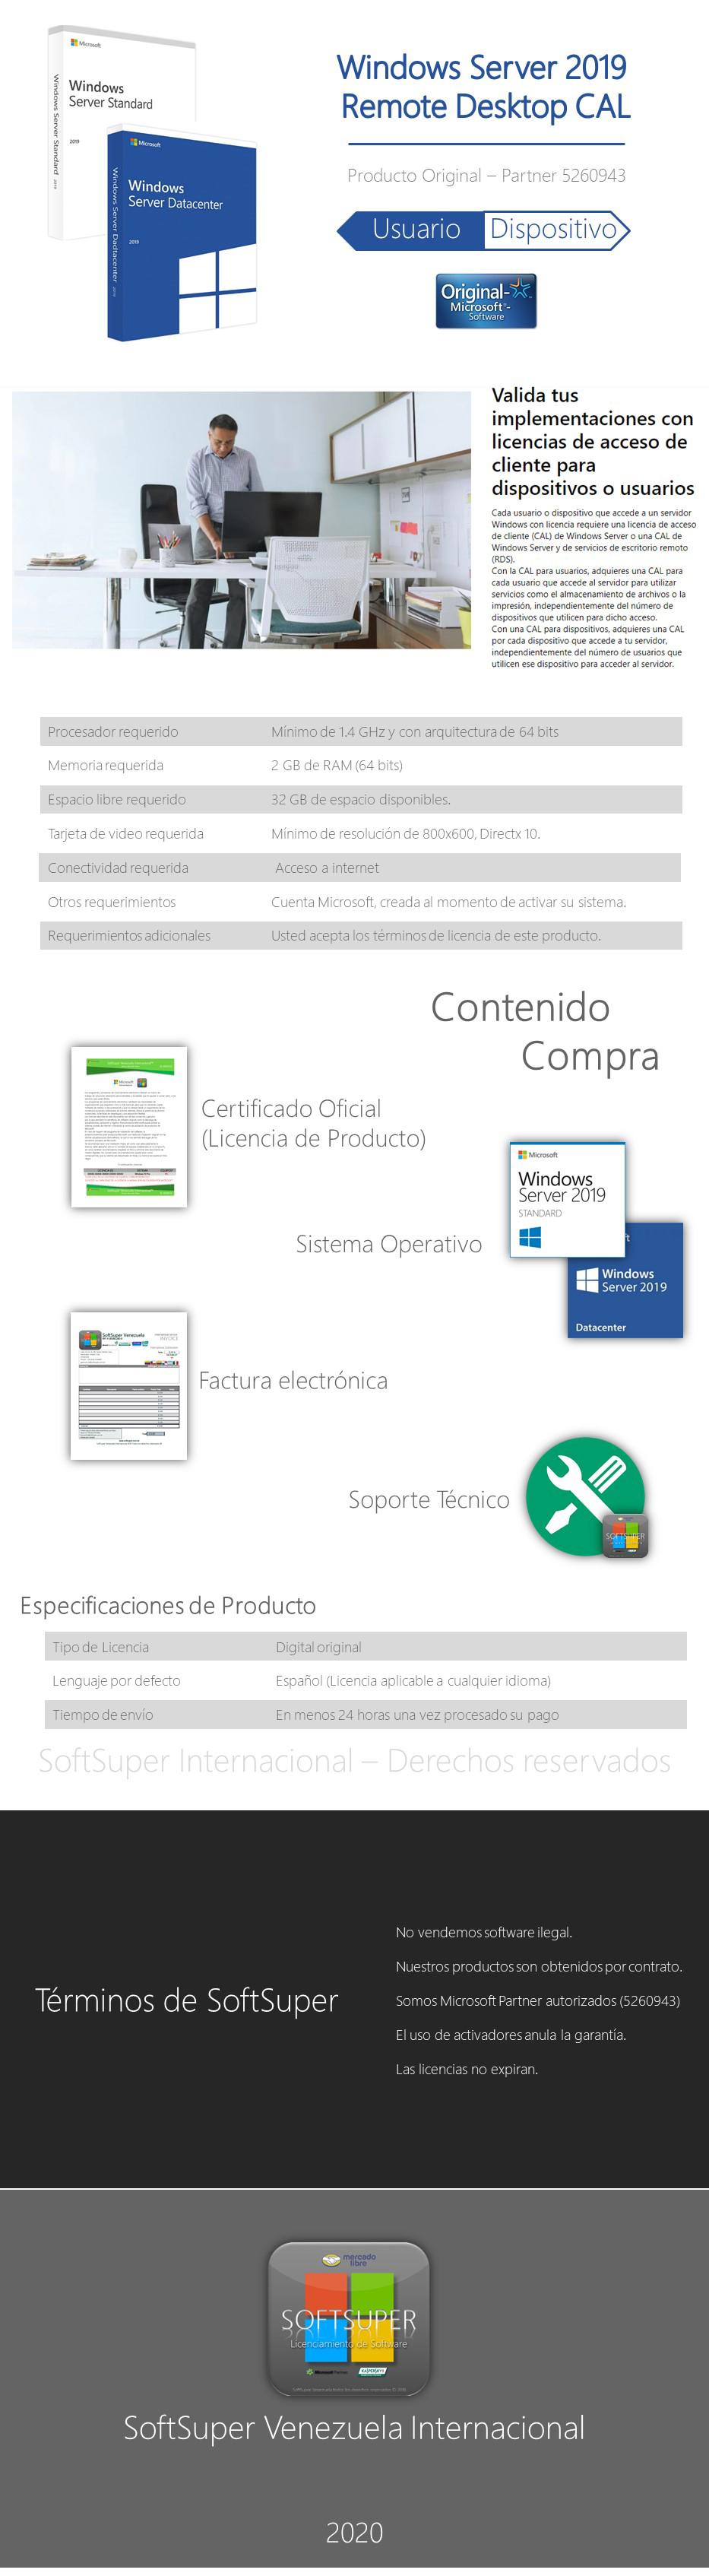 windowsserver2019cal